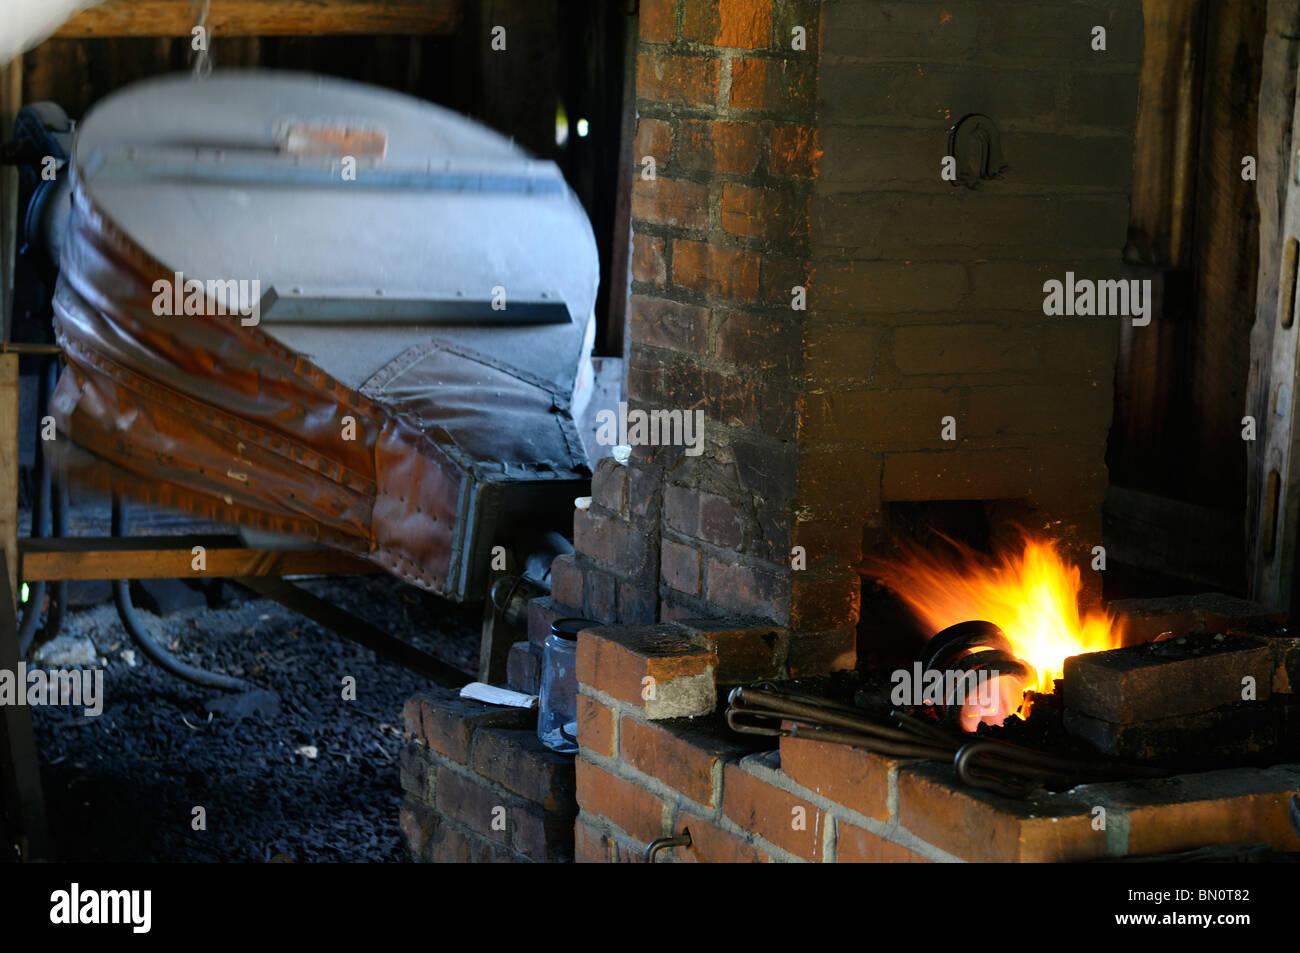 Historic Blacksmith Shop Bellows And Forge Furnace At Lang